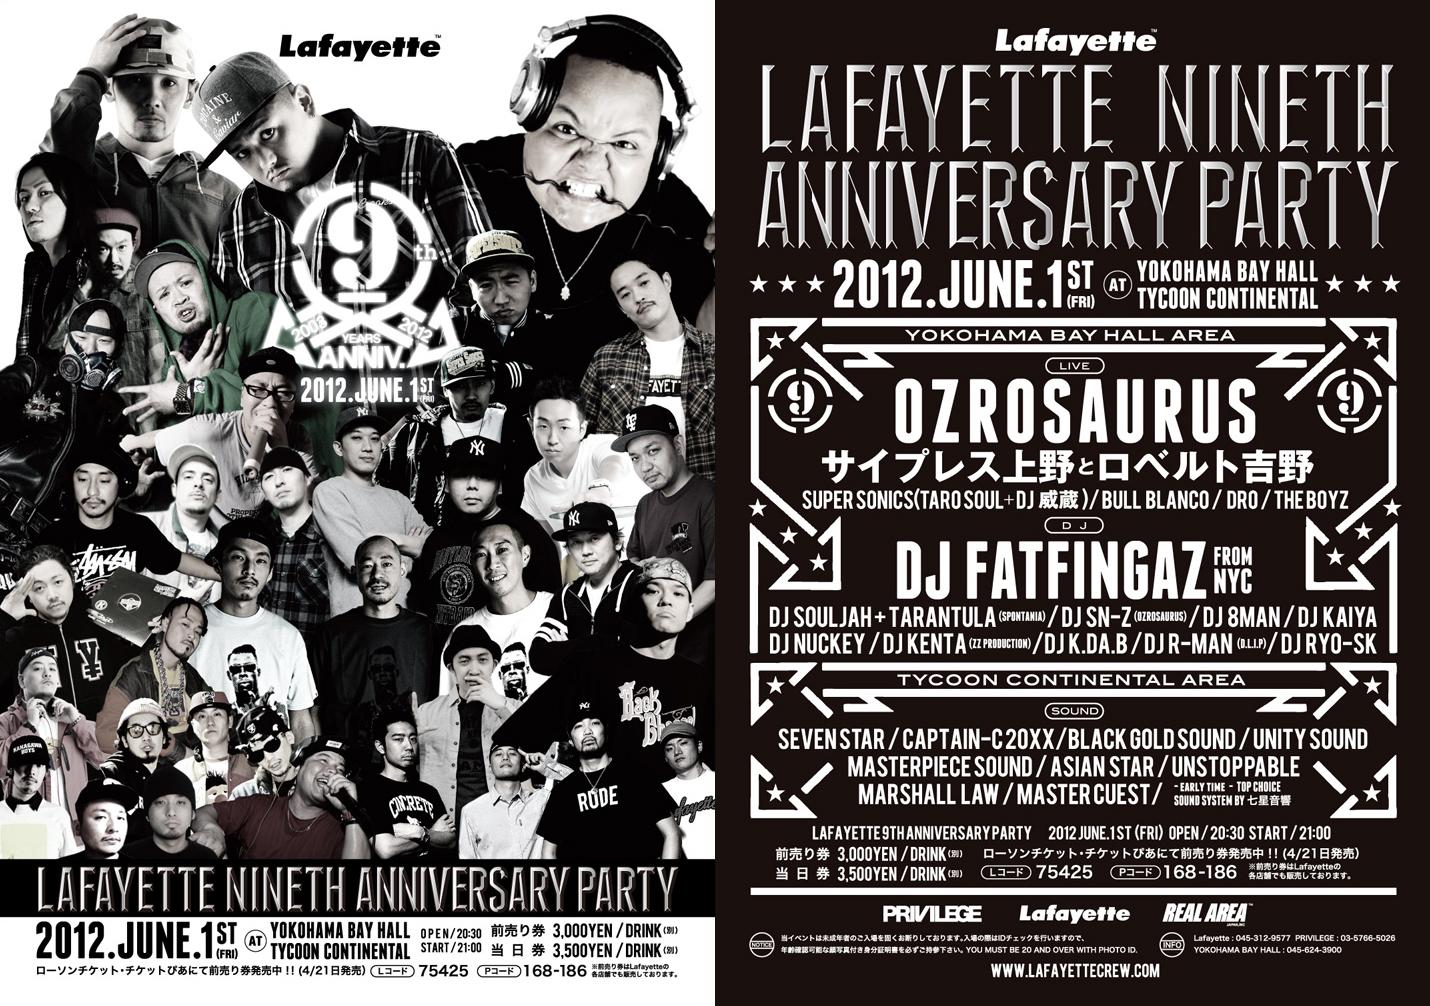 Lafayette 9th Anniversary Party recap #3 | Lafayette